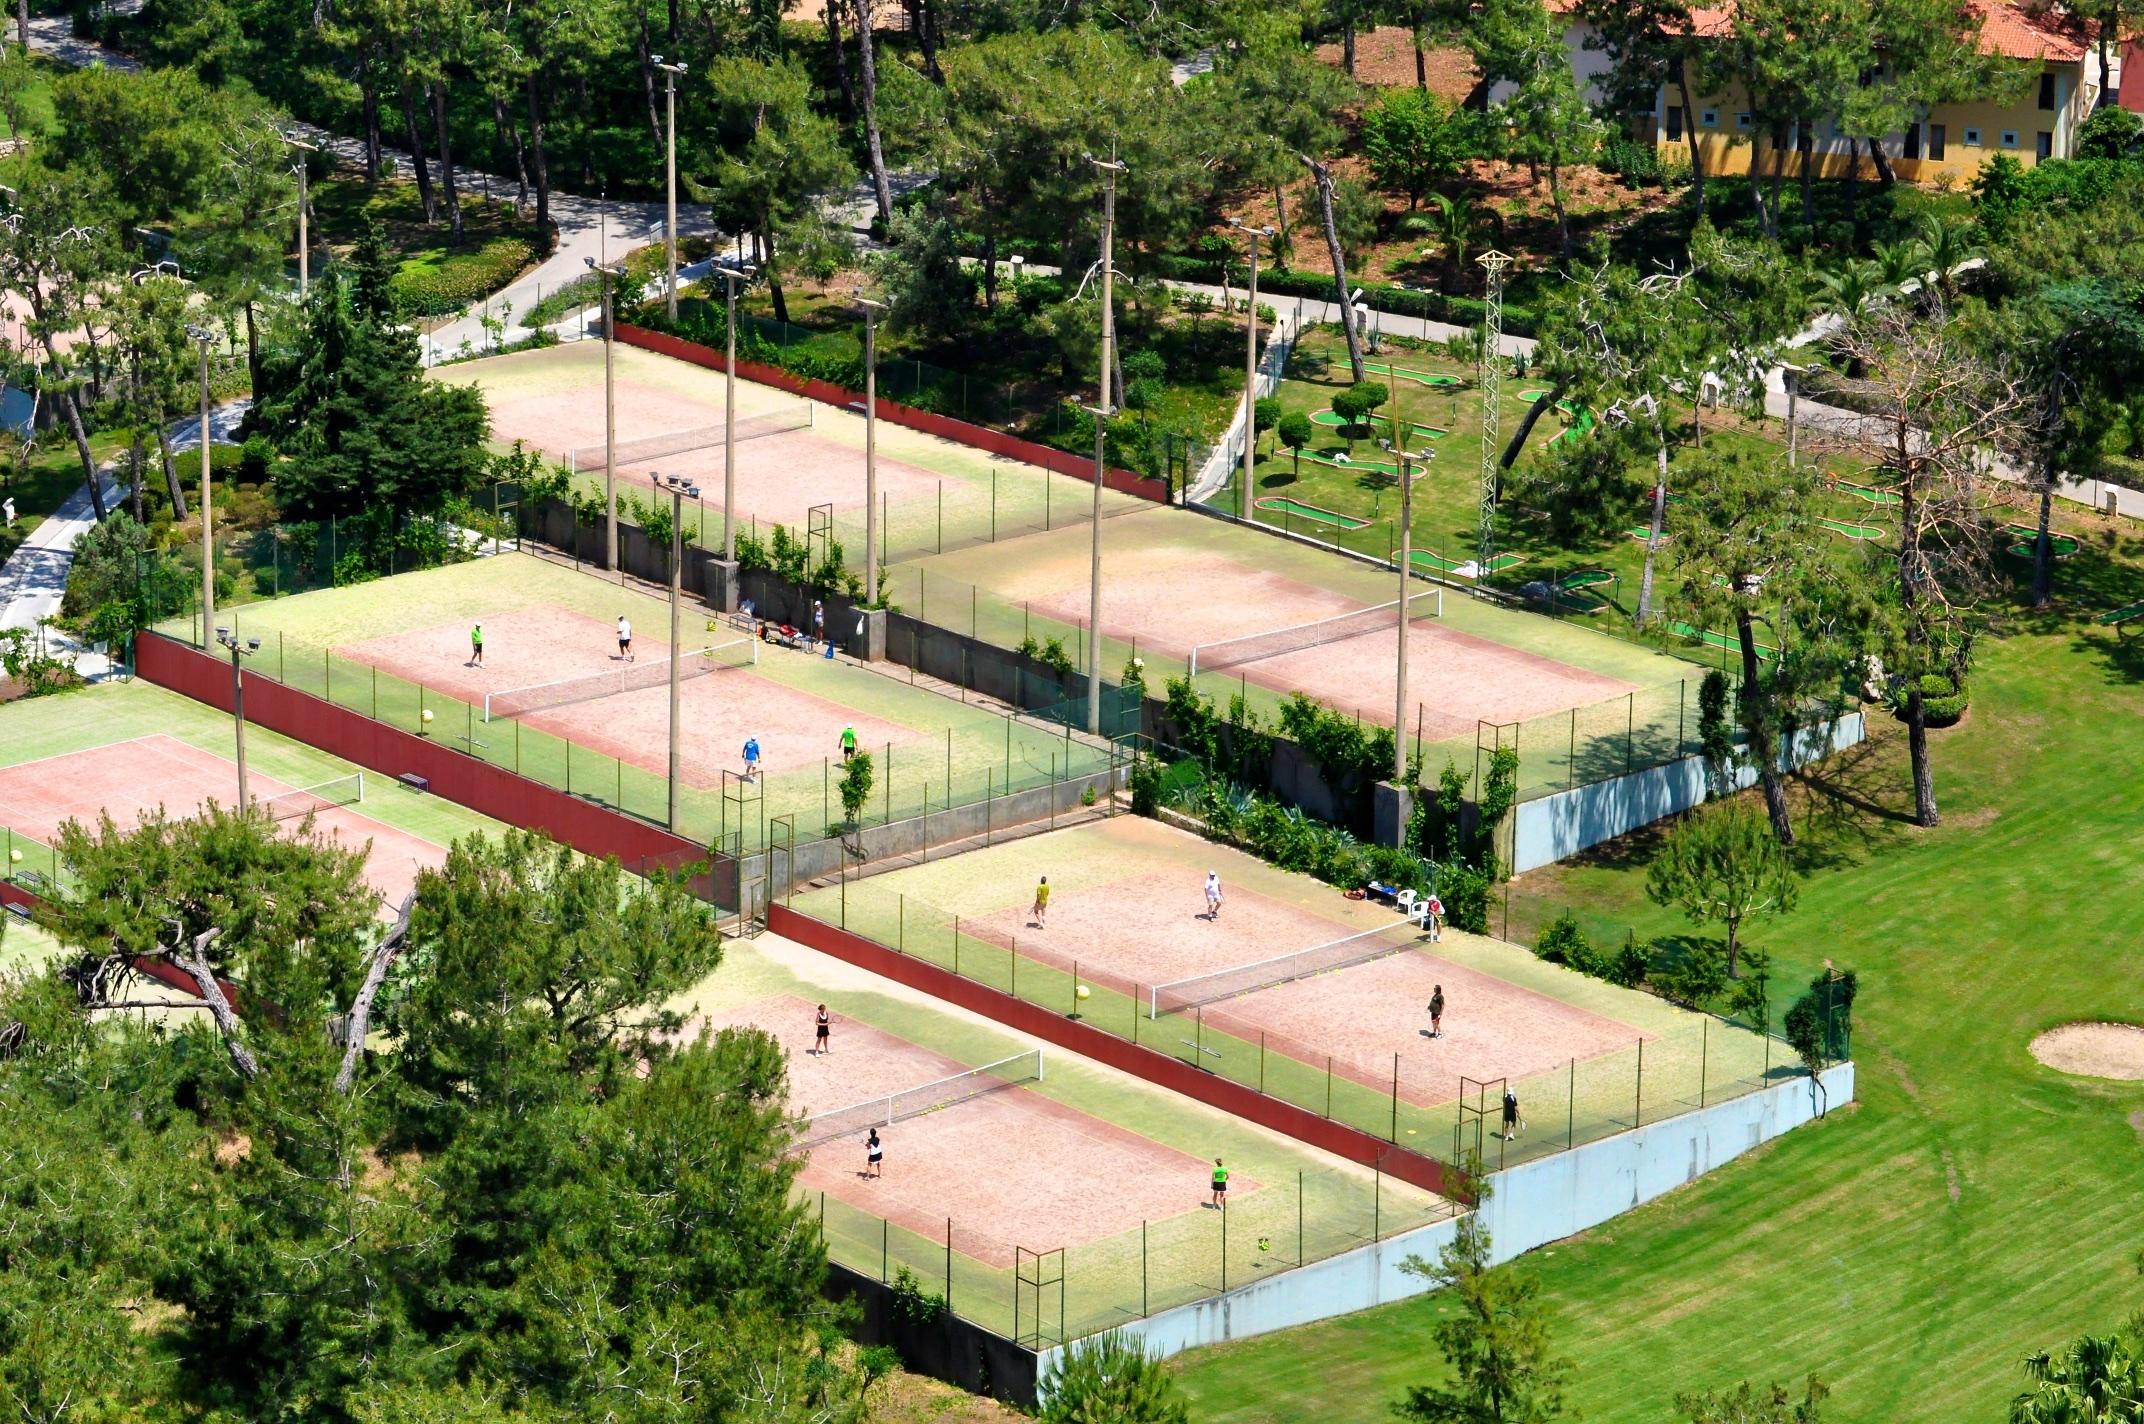 - book tennis